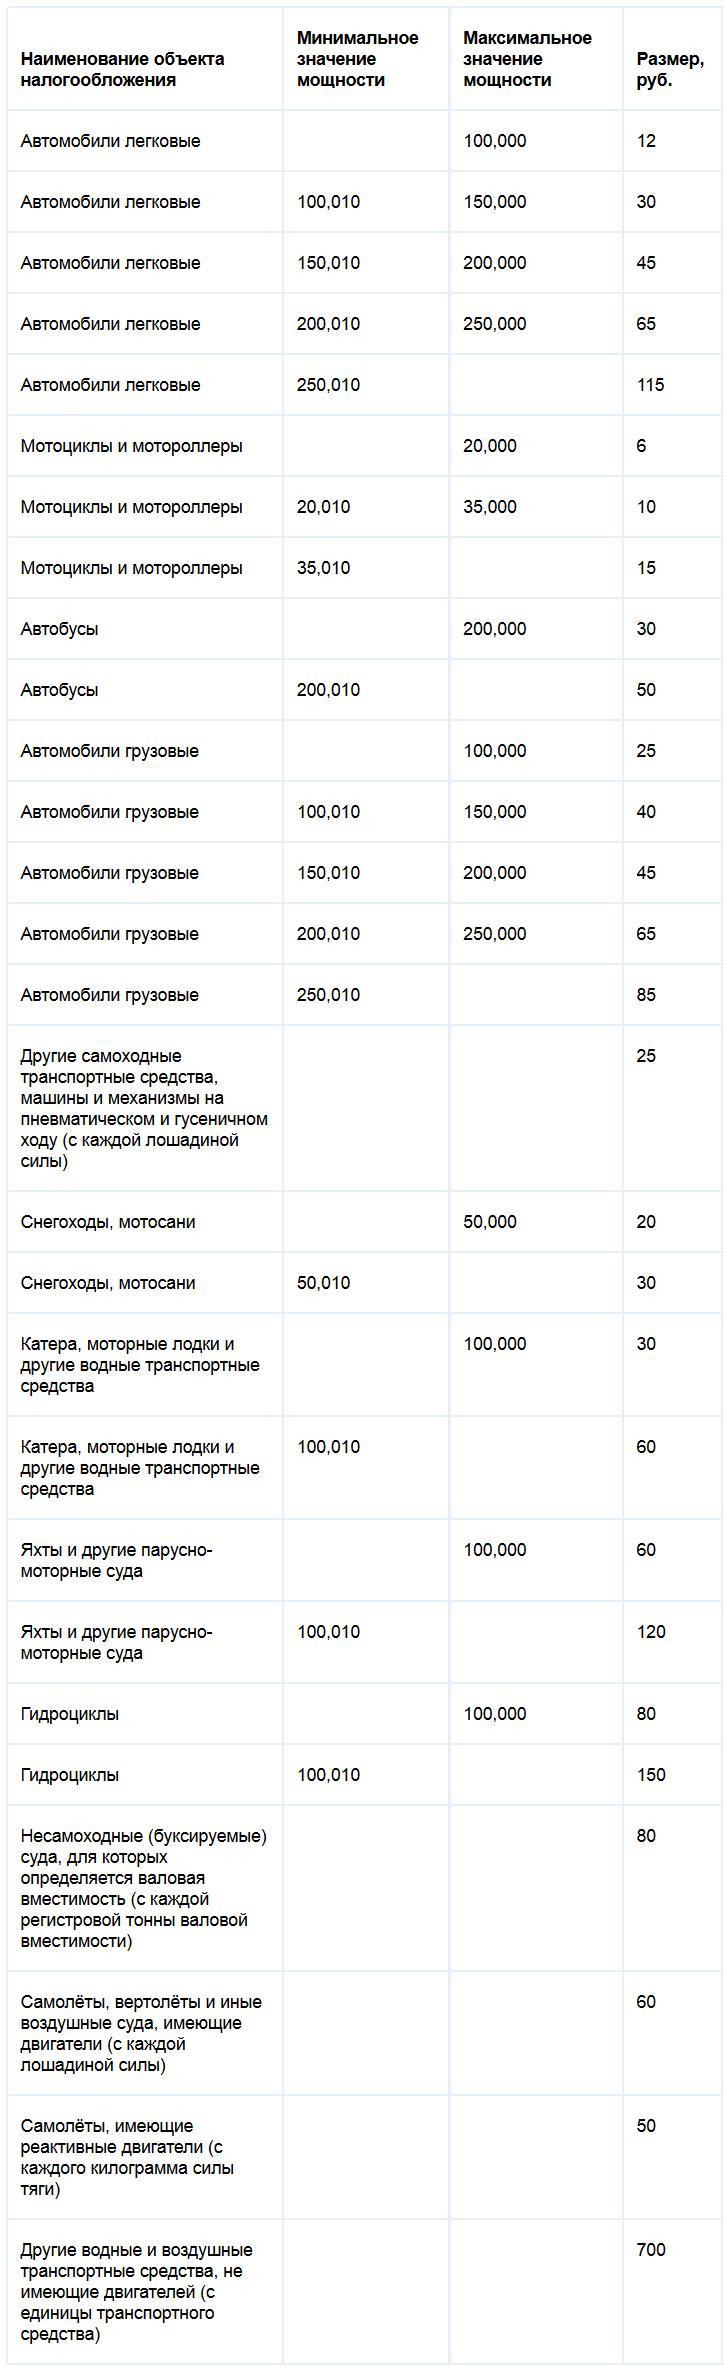 транспортный налог 2009 ставки пермь